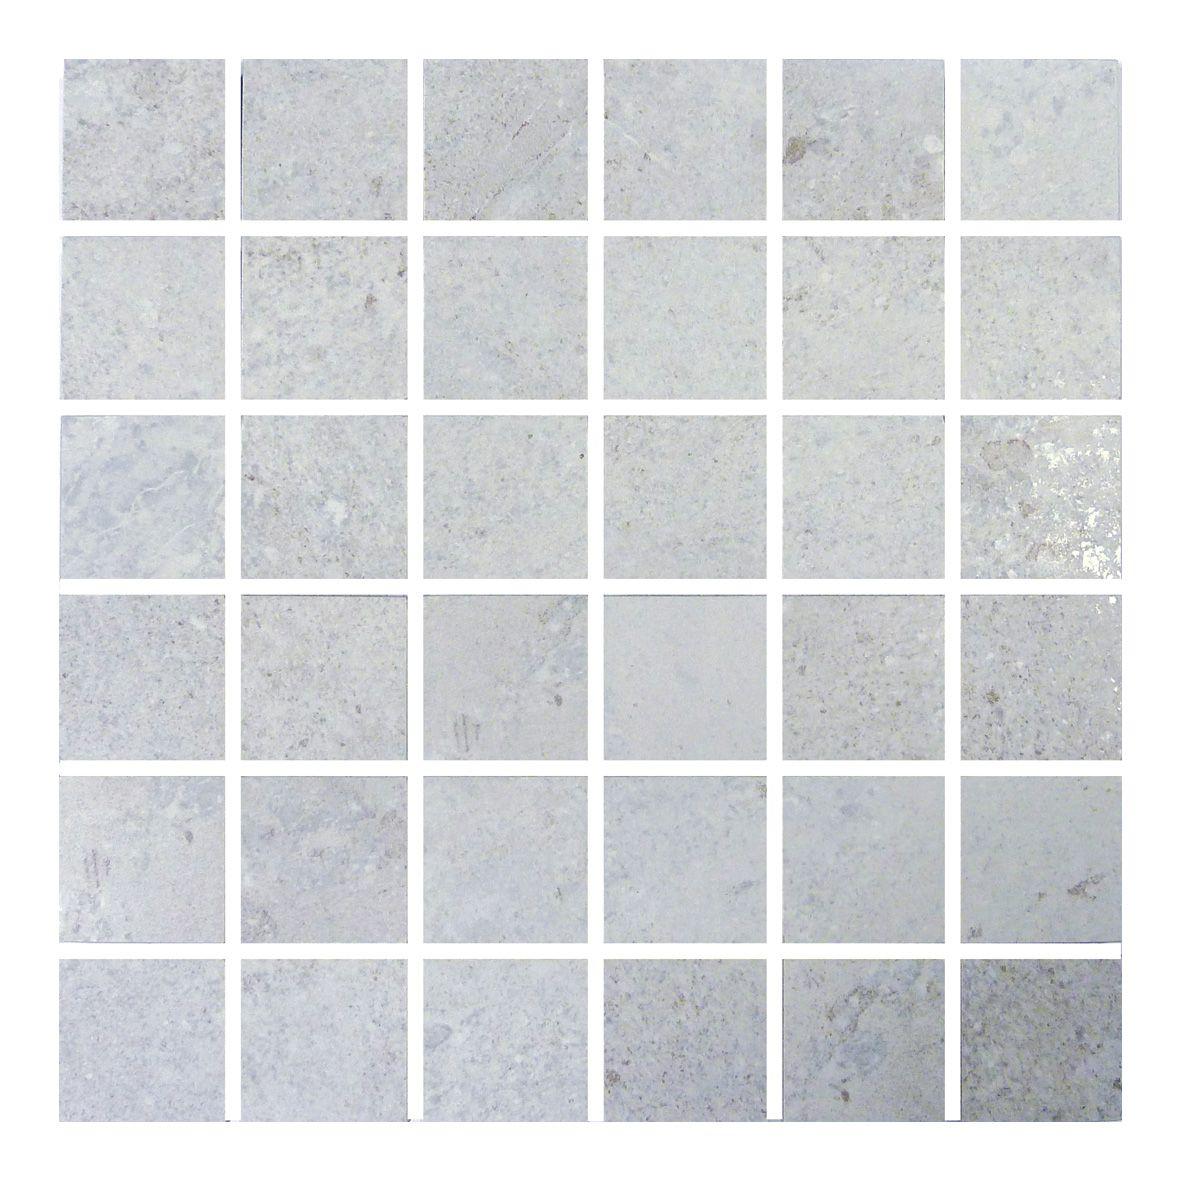 Gemini Hillock Light Grey Mosaic Bathroom, Kitchen ...